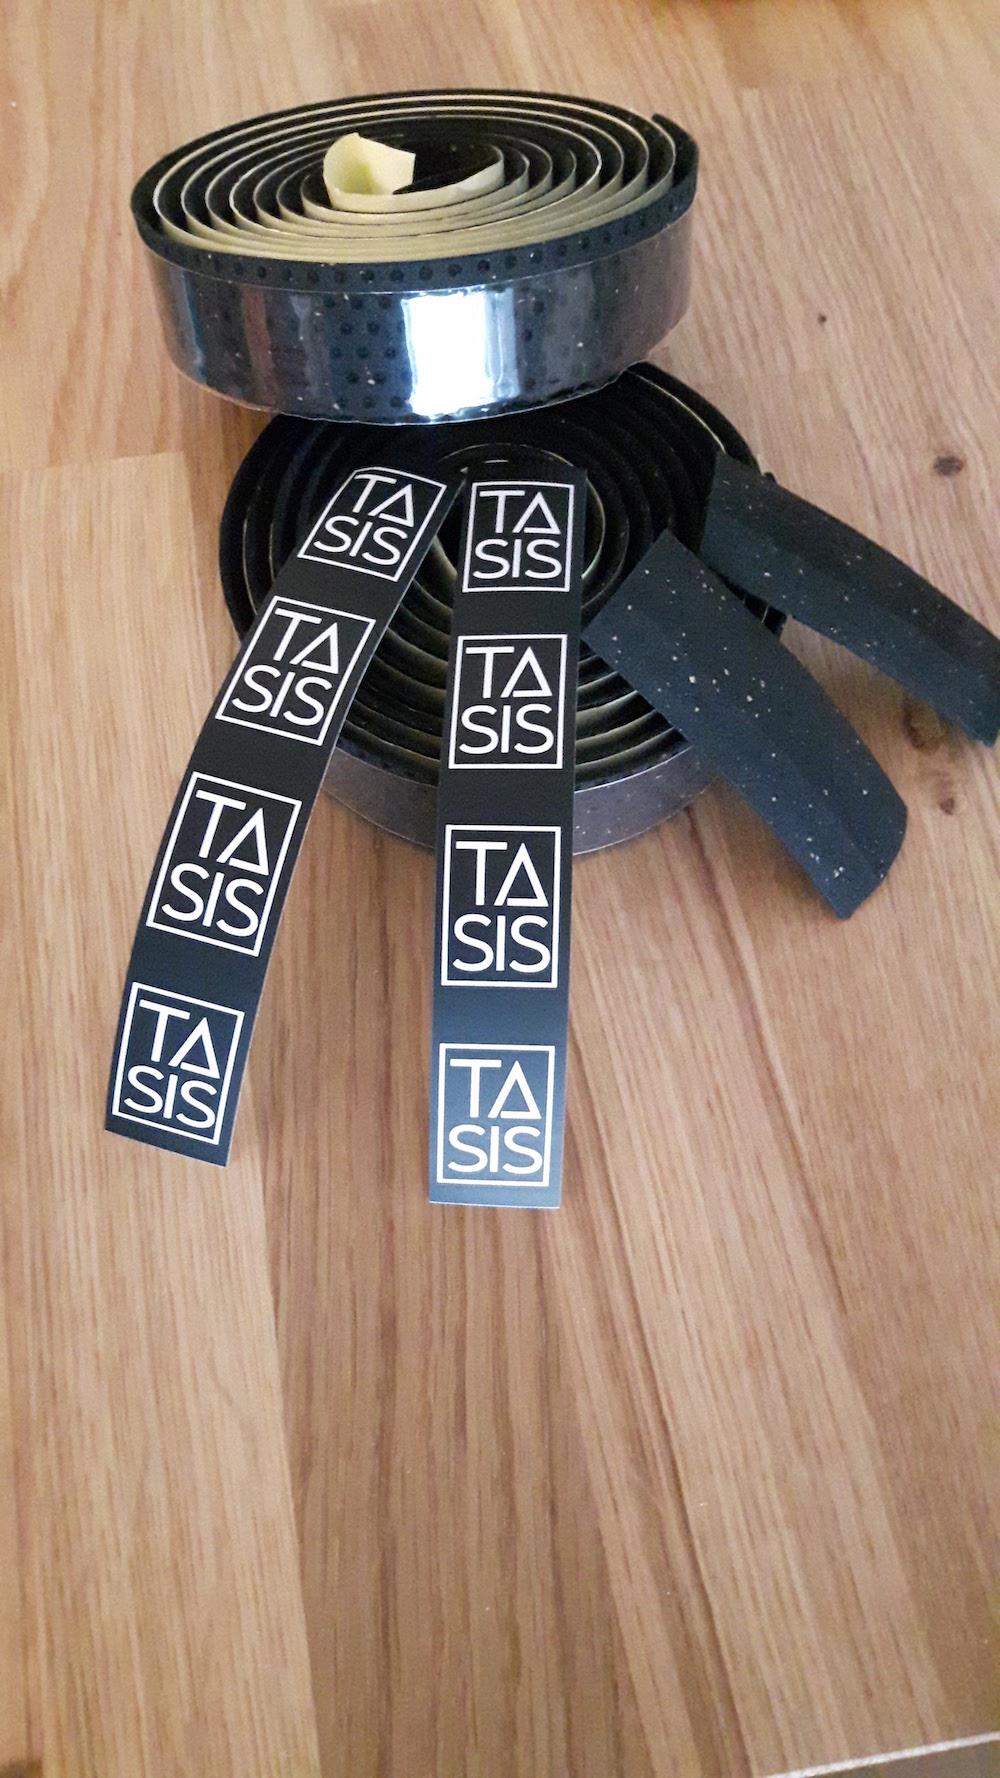 fat-wrap tape kit